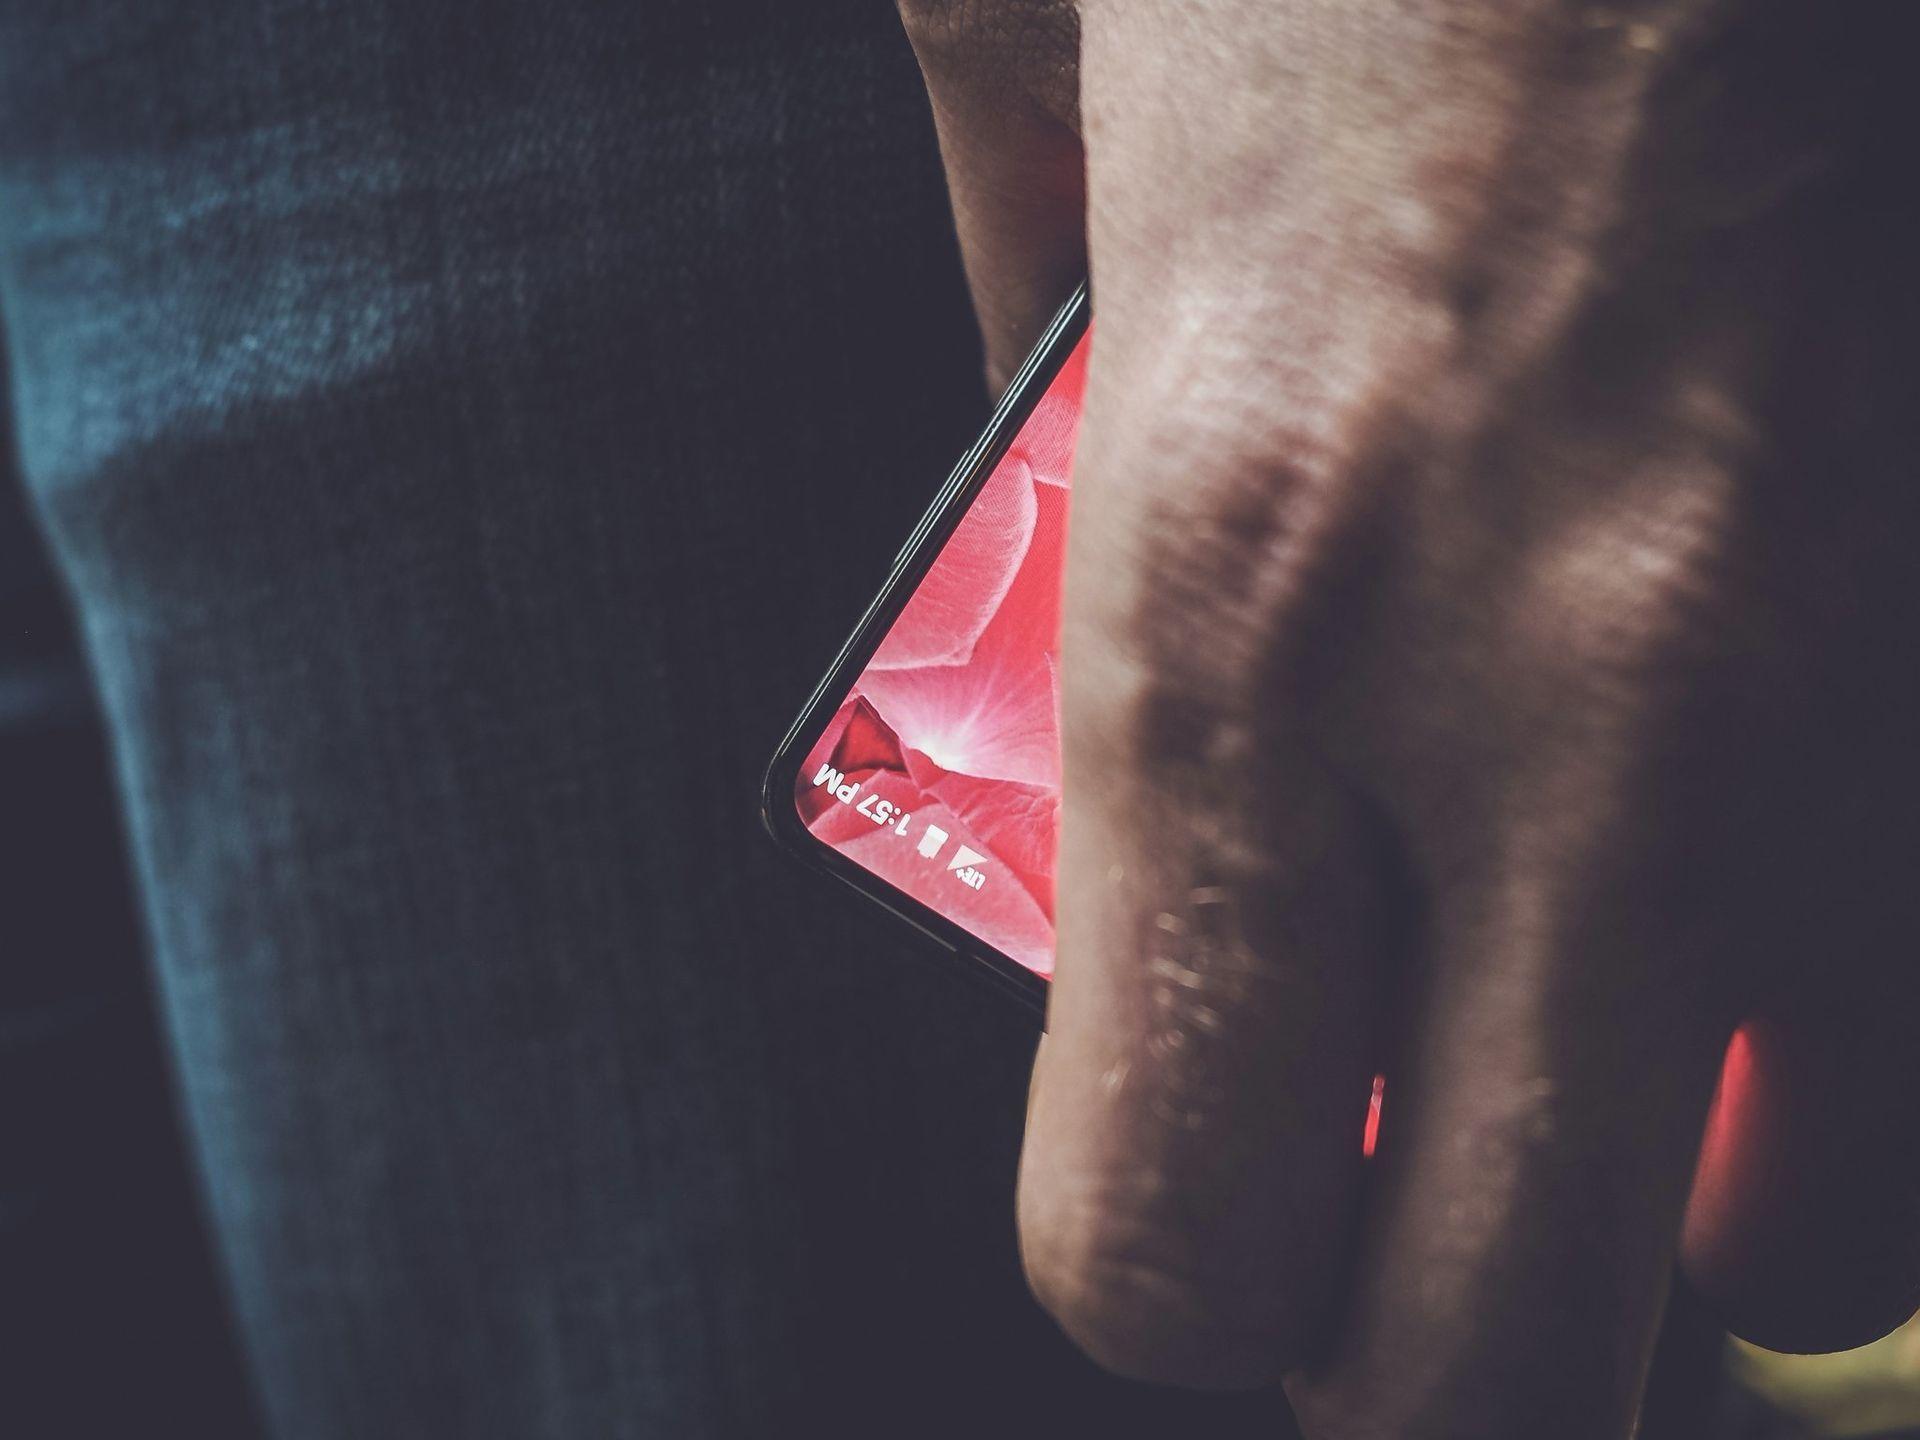 Andy Rubins nya telefon kan visas upp i morgon